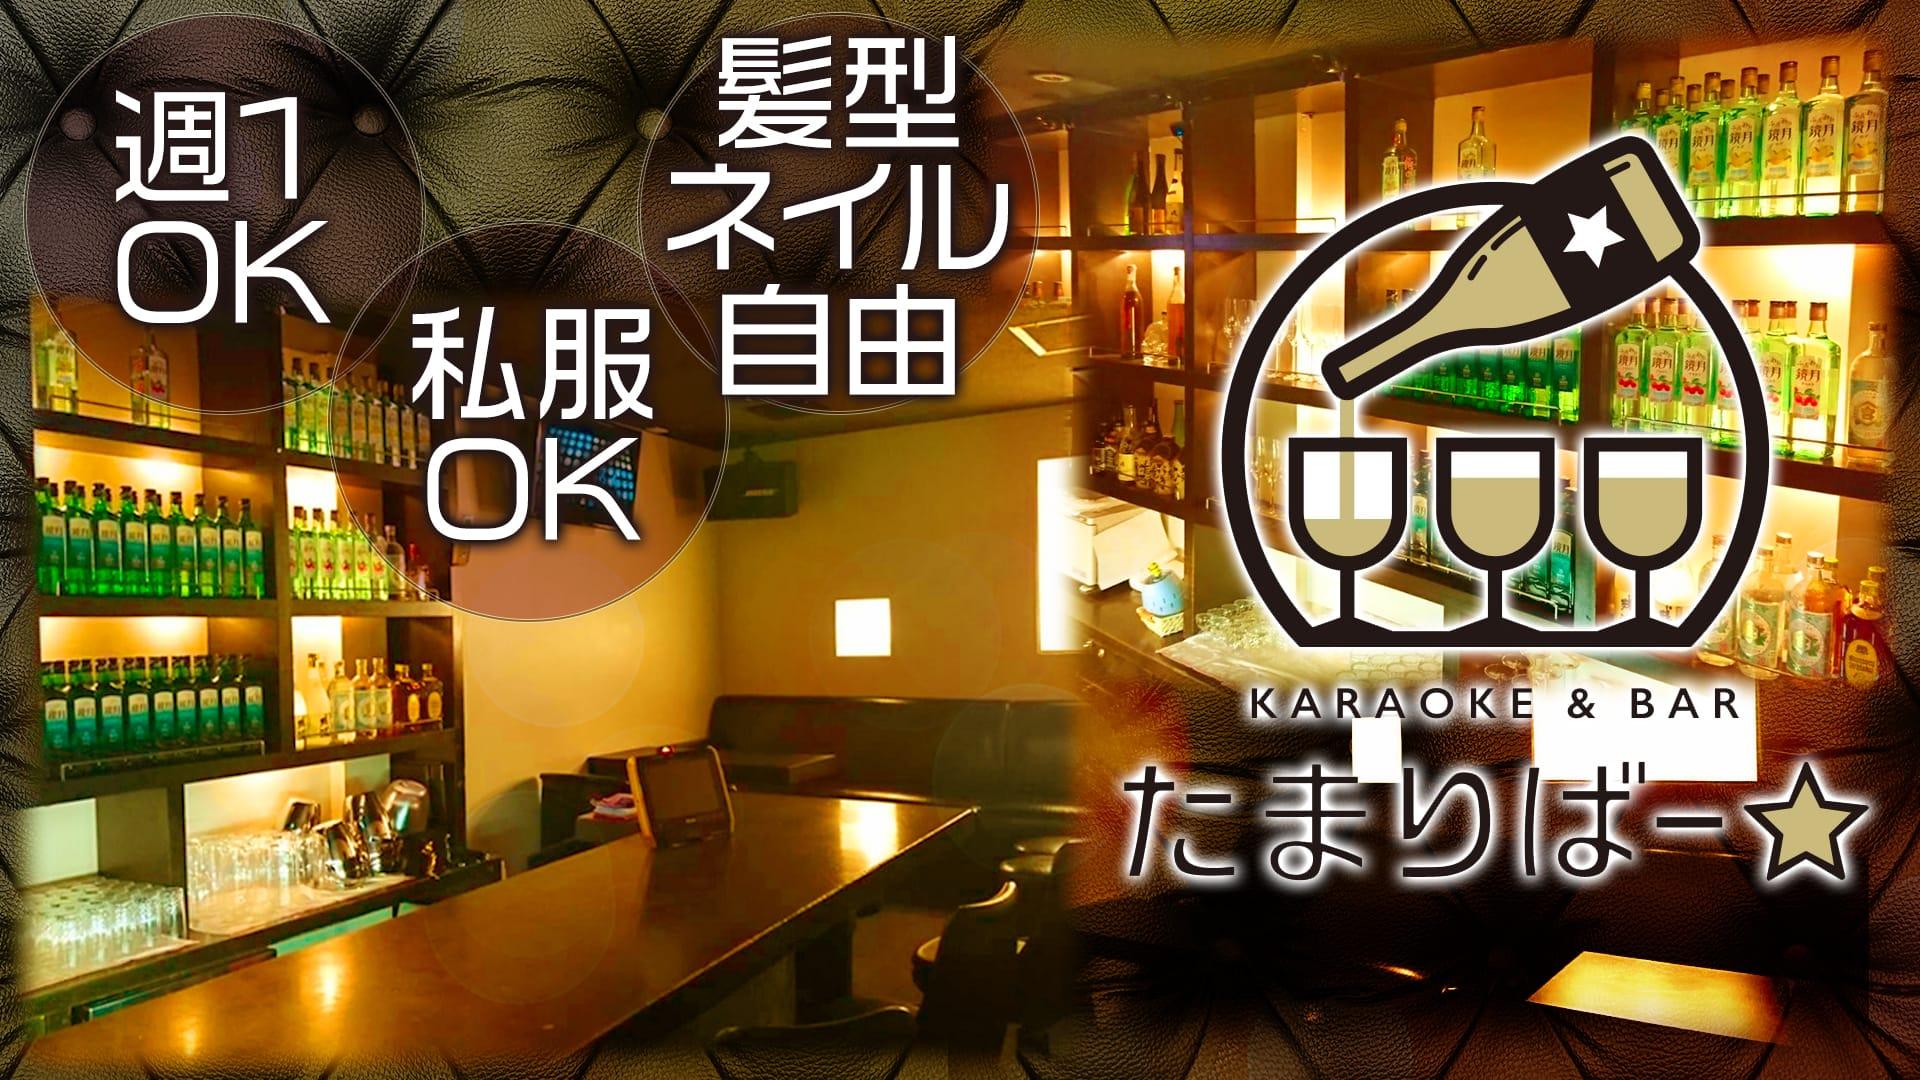 KARAOKE BAR たまりばー★ 吉祥寺 ガールズバー TOP画像